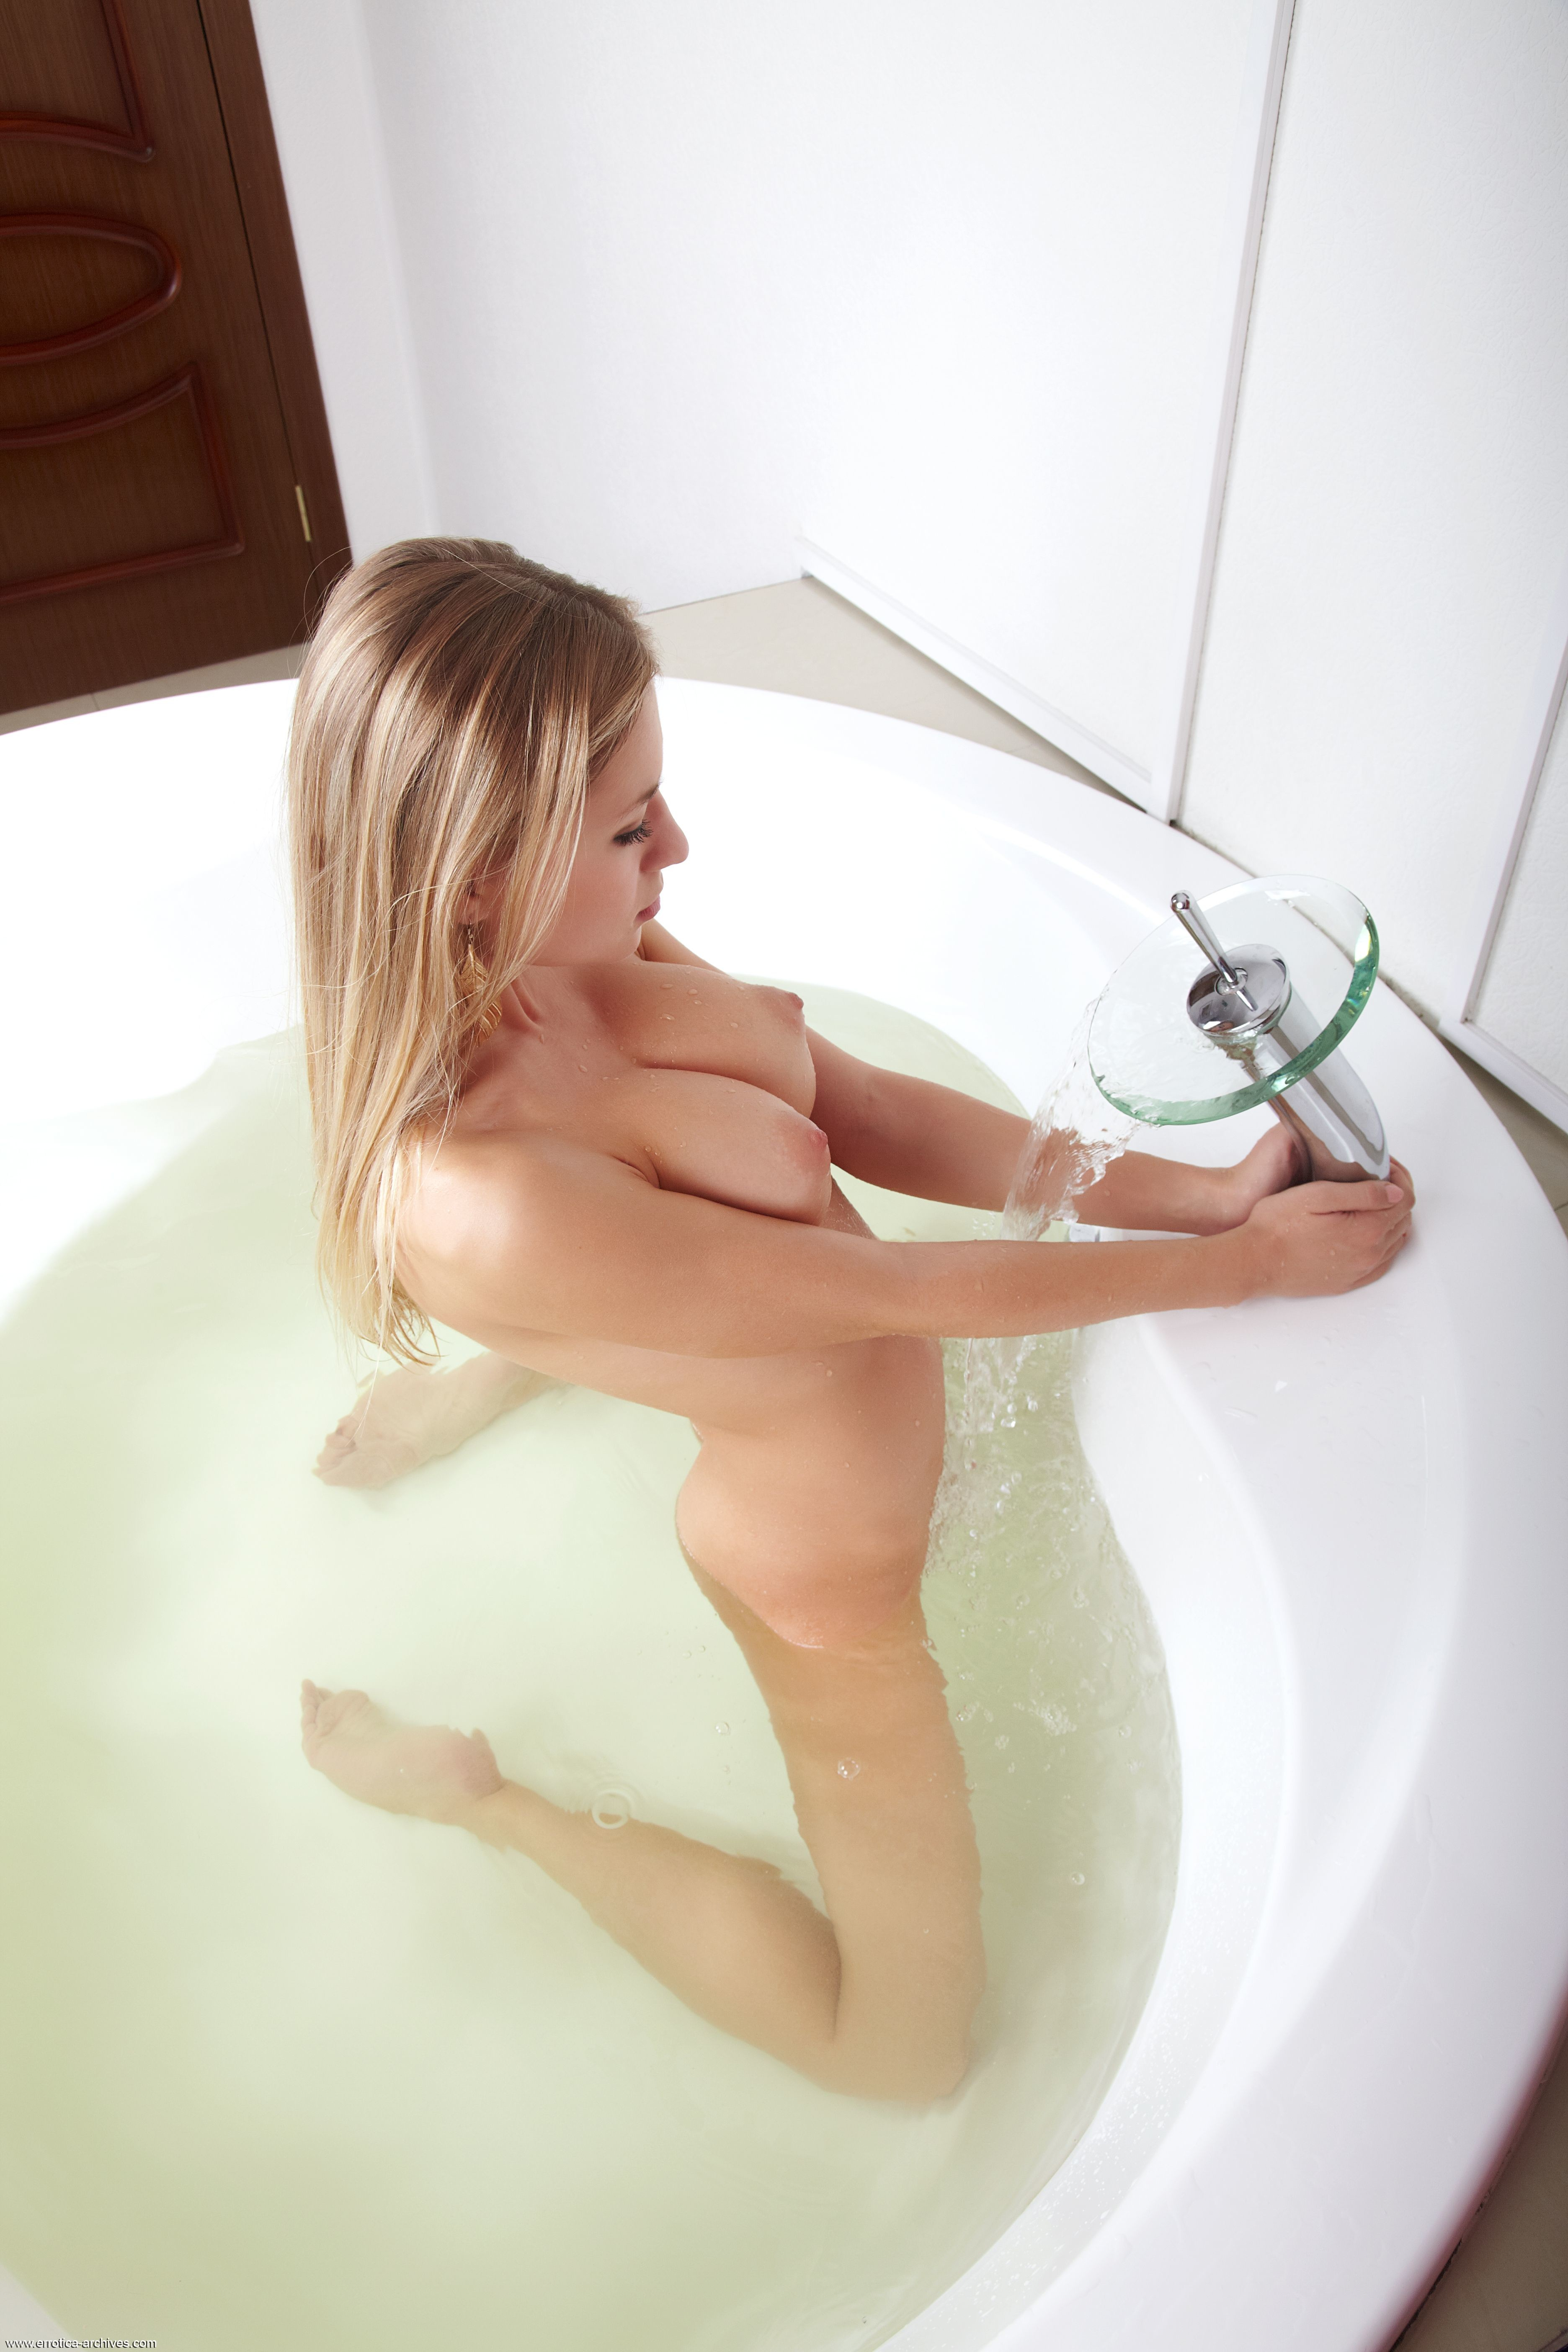 naked-girls-taking-bath-boobs-wet-mix-vol4-12